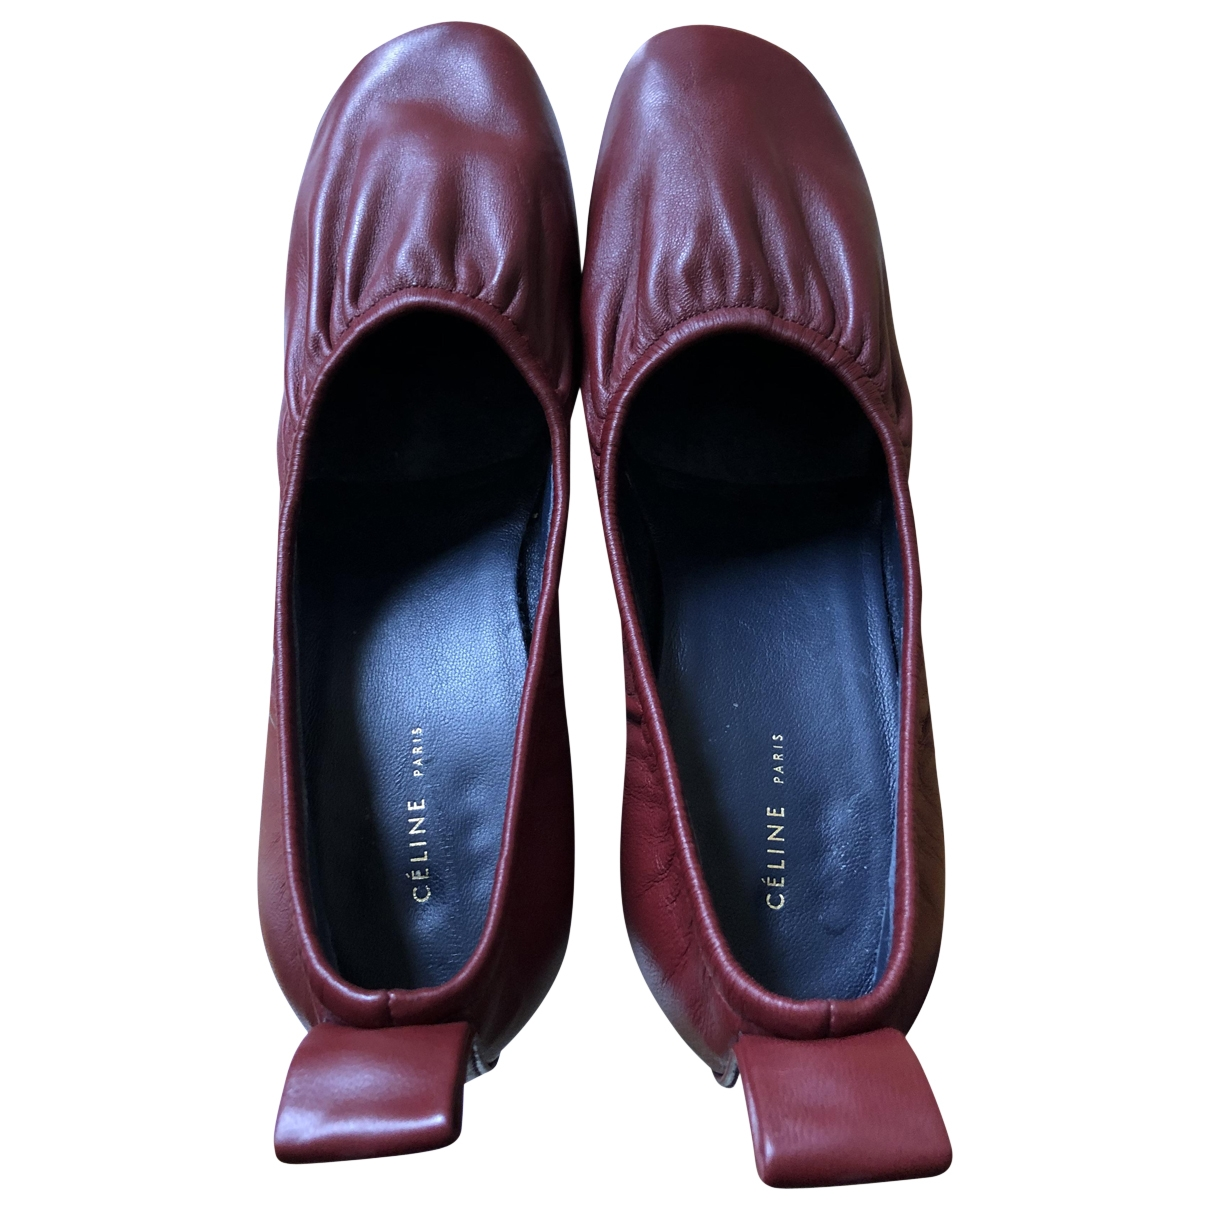 Celine Soft Ballerina Burgundy Leather Heels for Women 36 EU